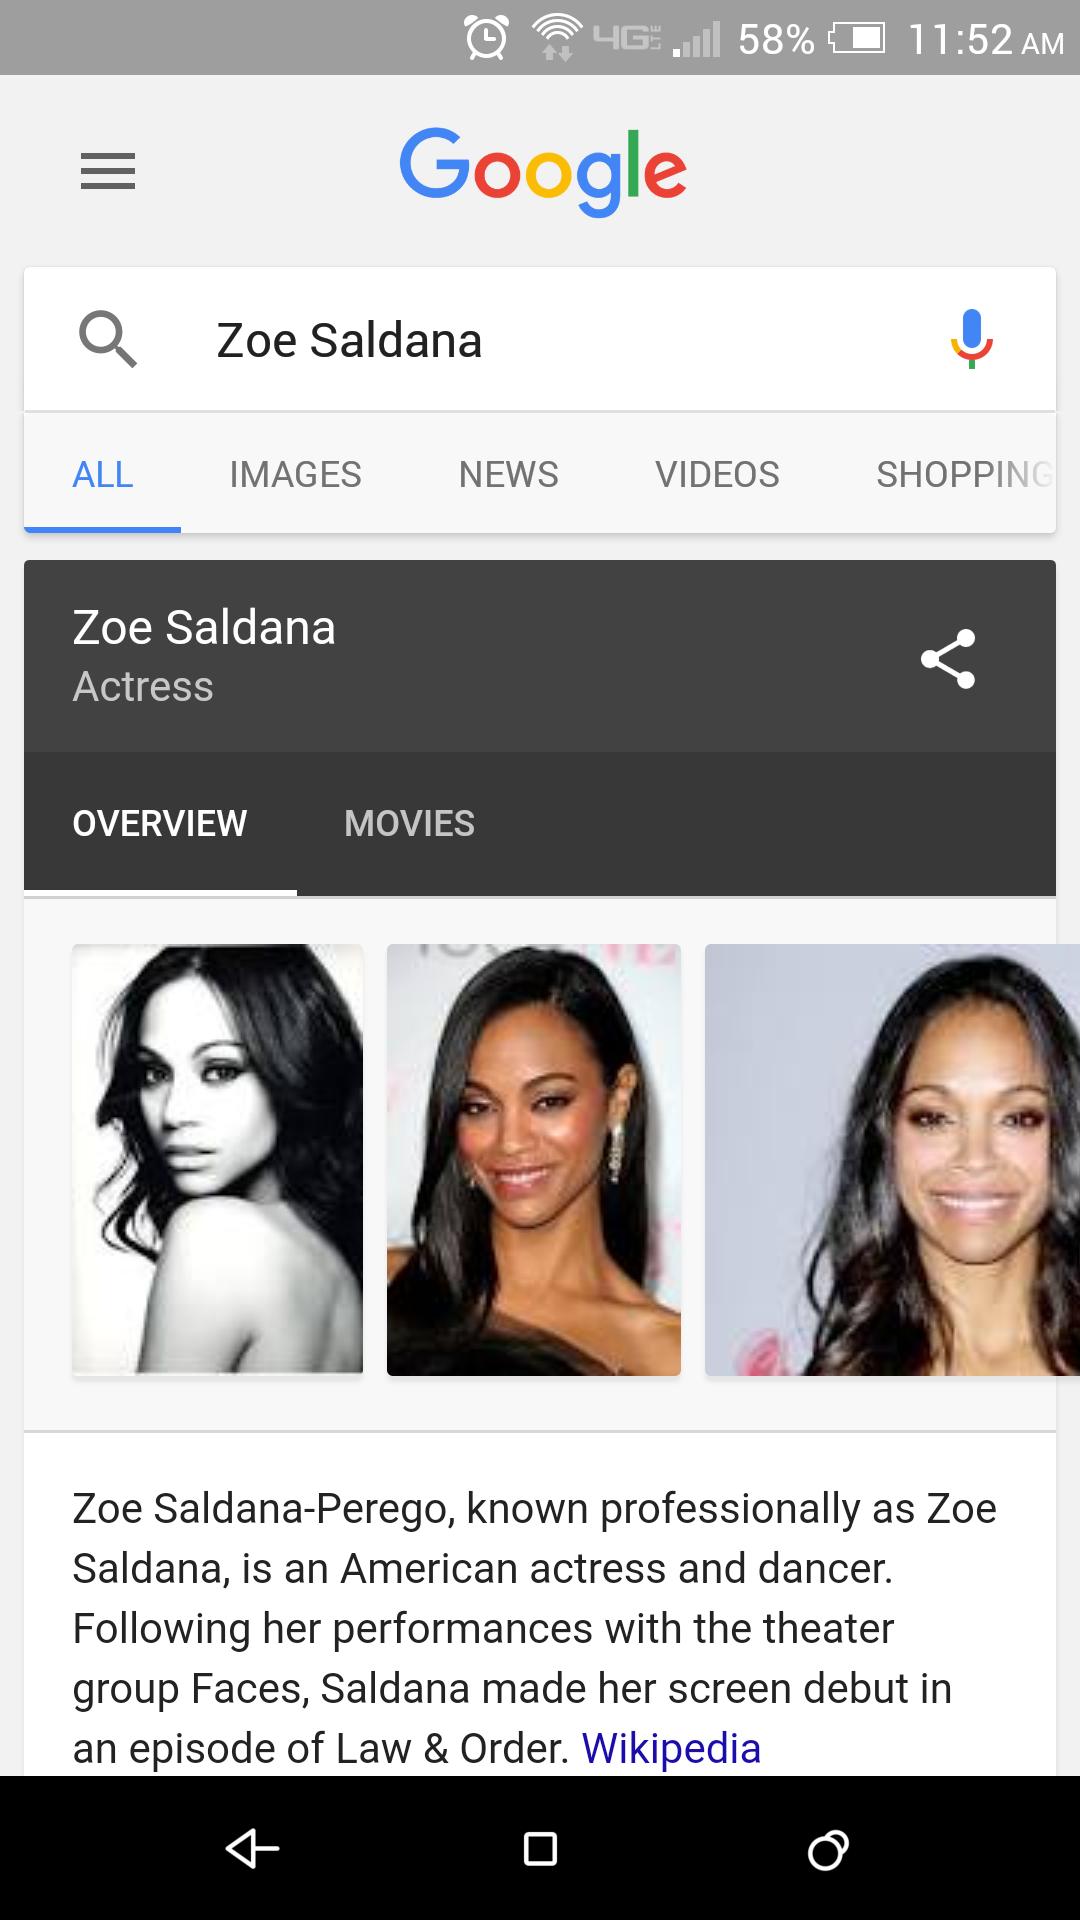 Google Voice Search Zoe Saldana